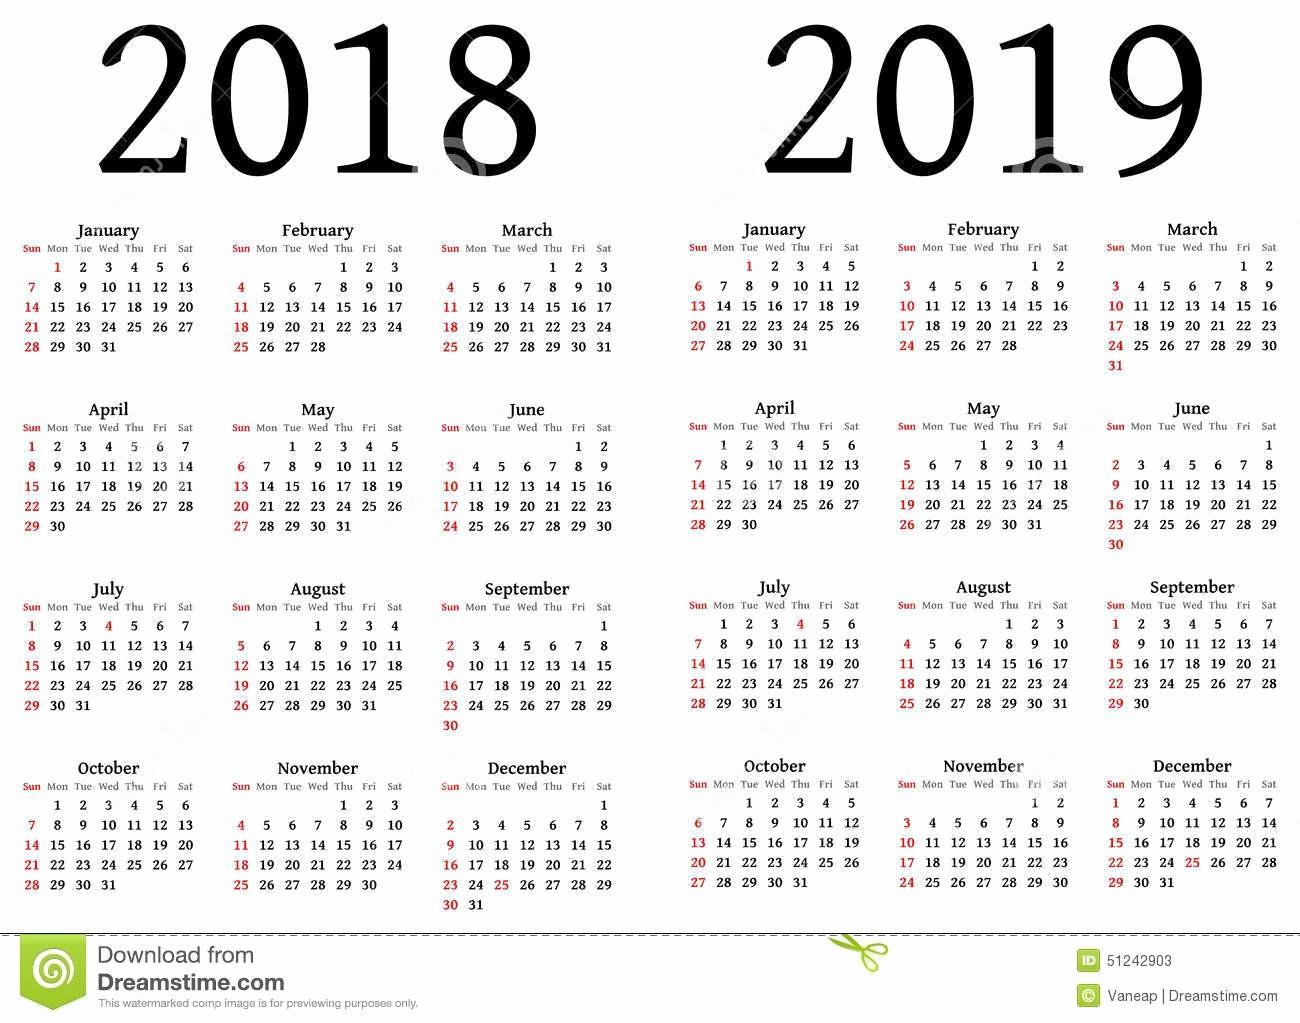 2018 and 2019 Printable Calendar Awesome Julian Calendar 2018 and 2019